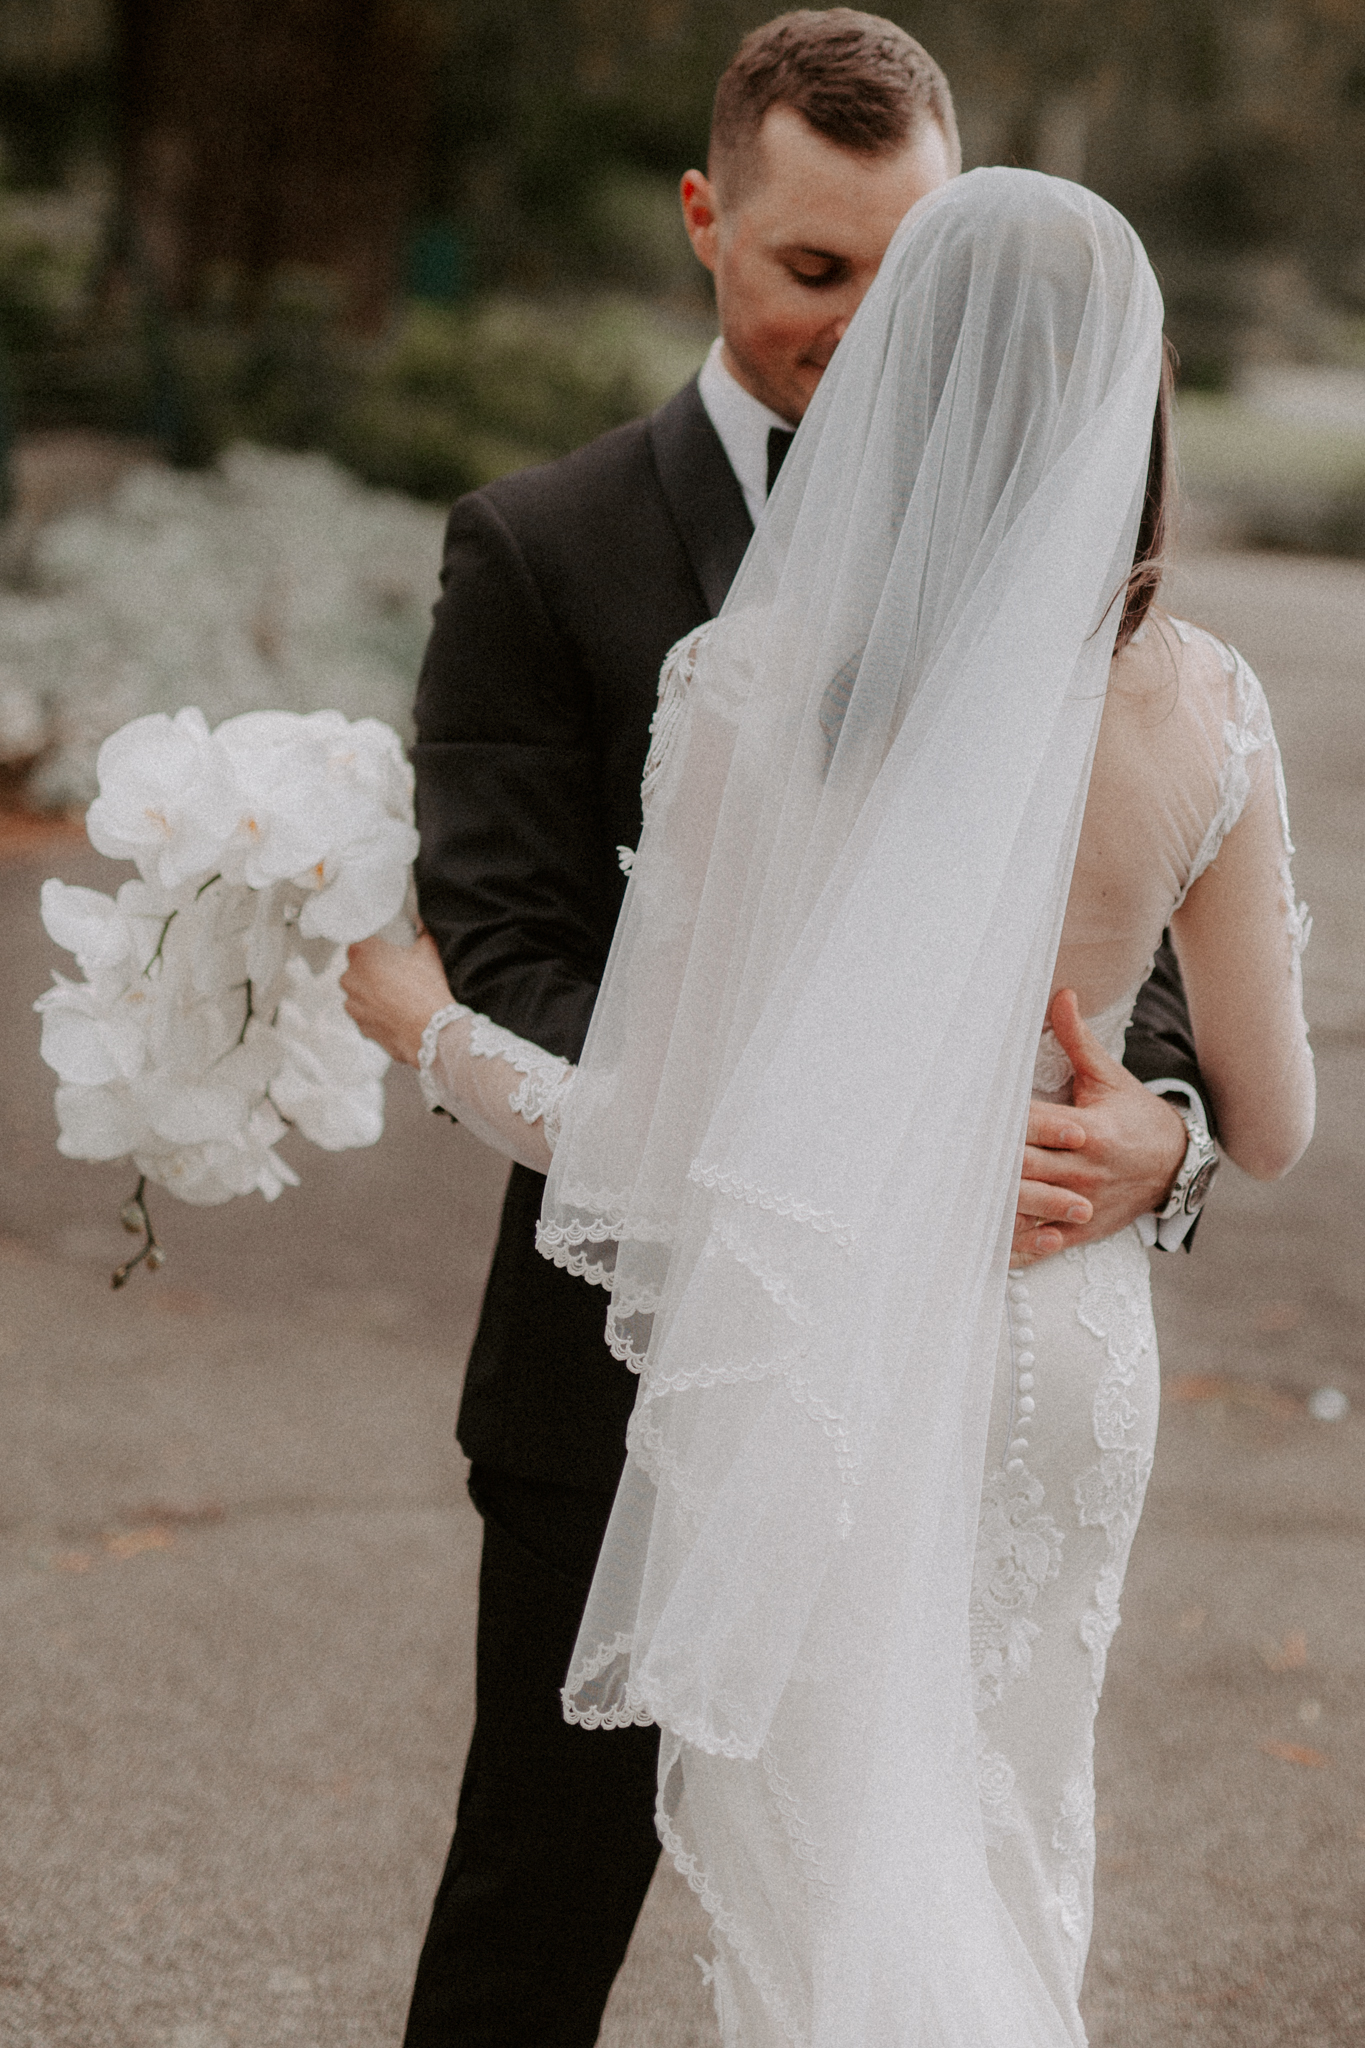 The-Terrace-Royal-Botanic-Gardens-Wedding-Emotions-and-Math-Photography-092.jpg